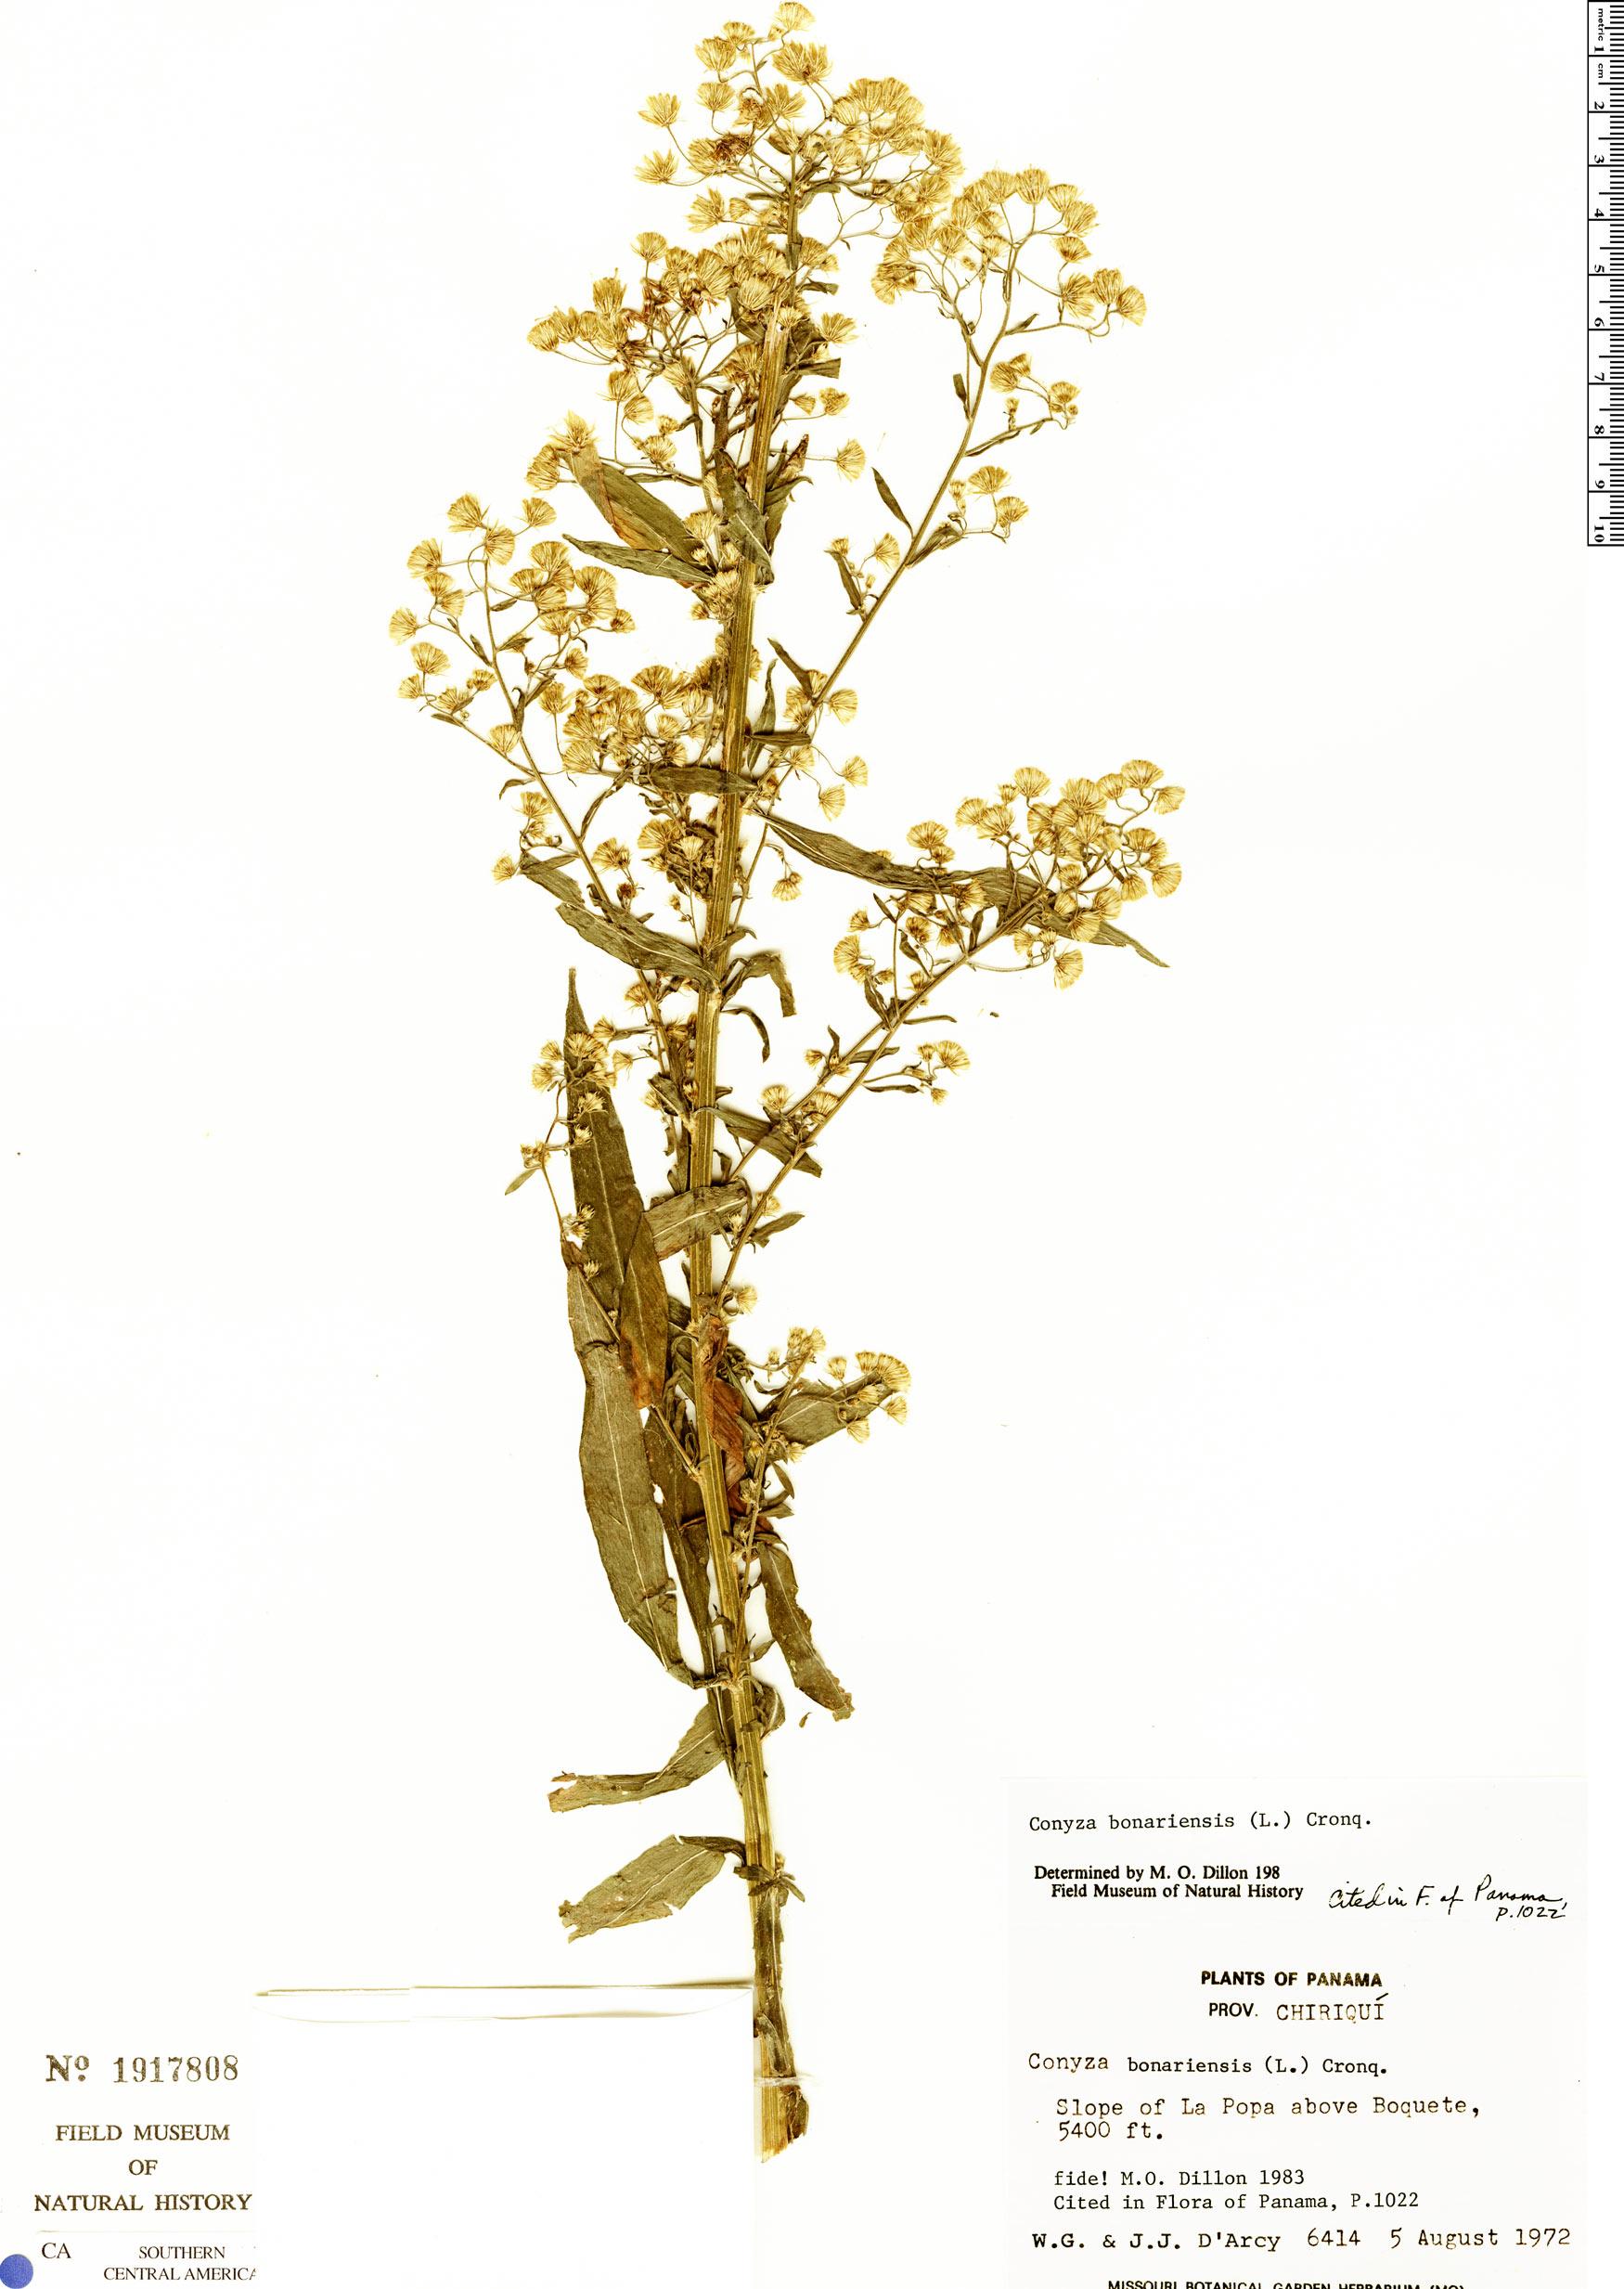 Specimen: Conyza bonariensis